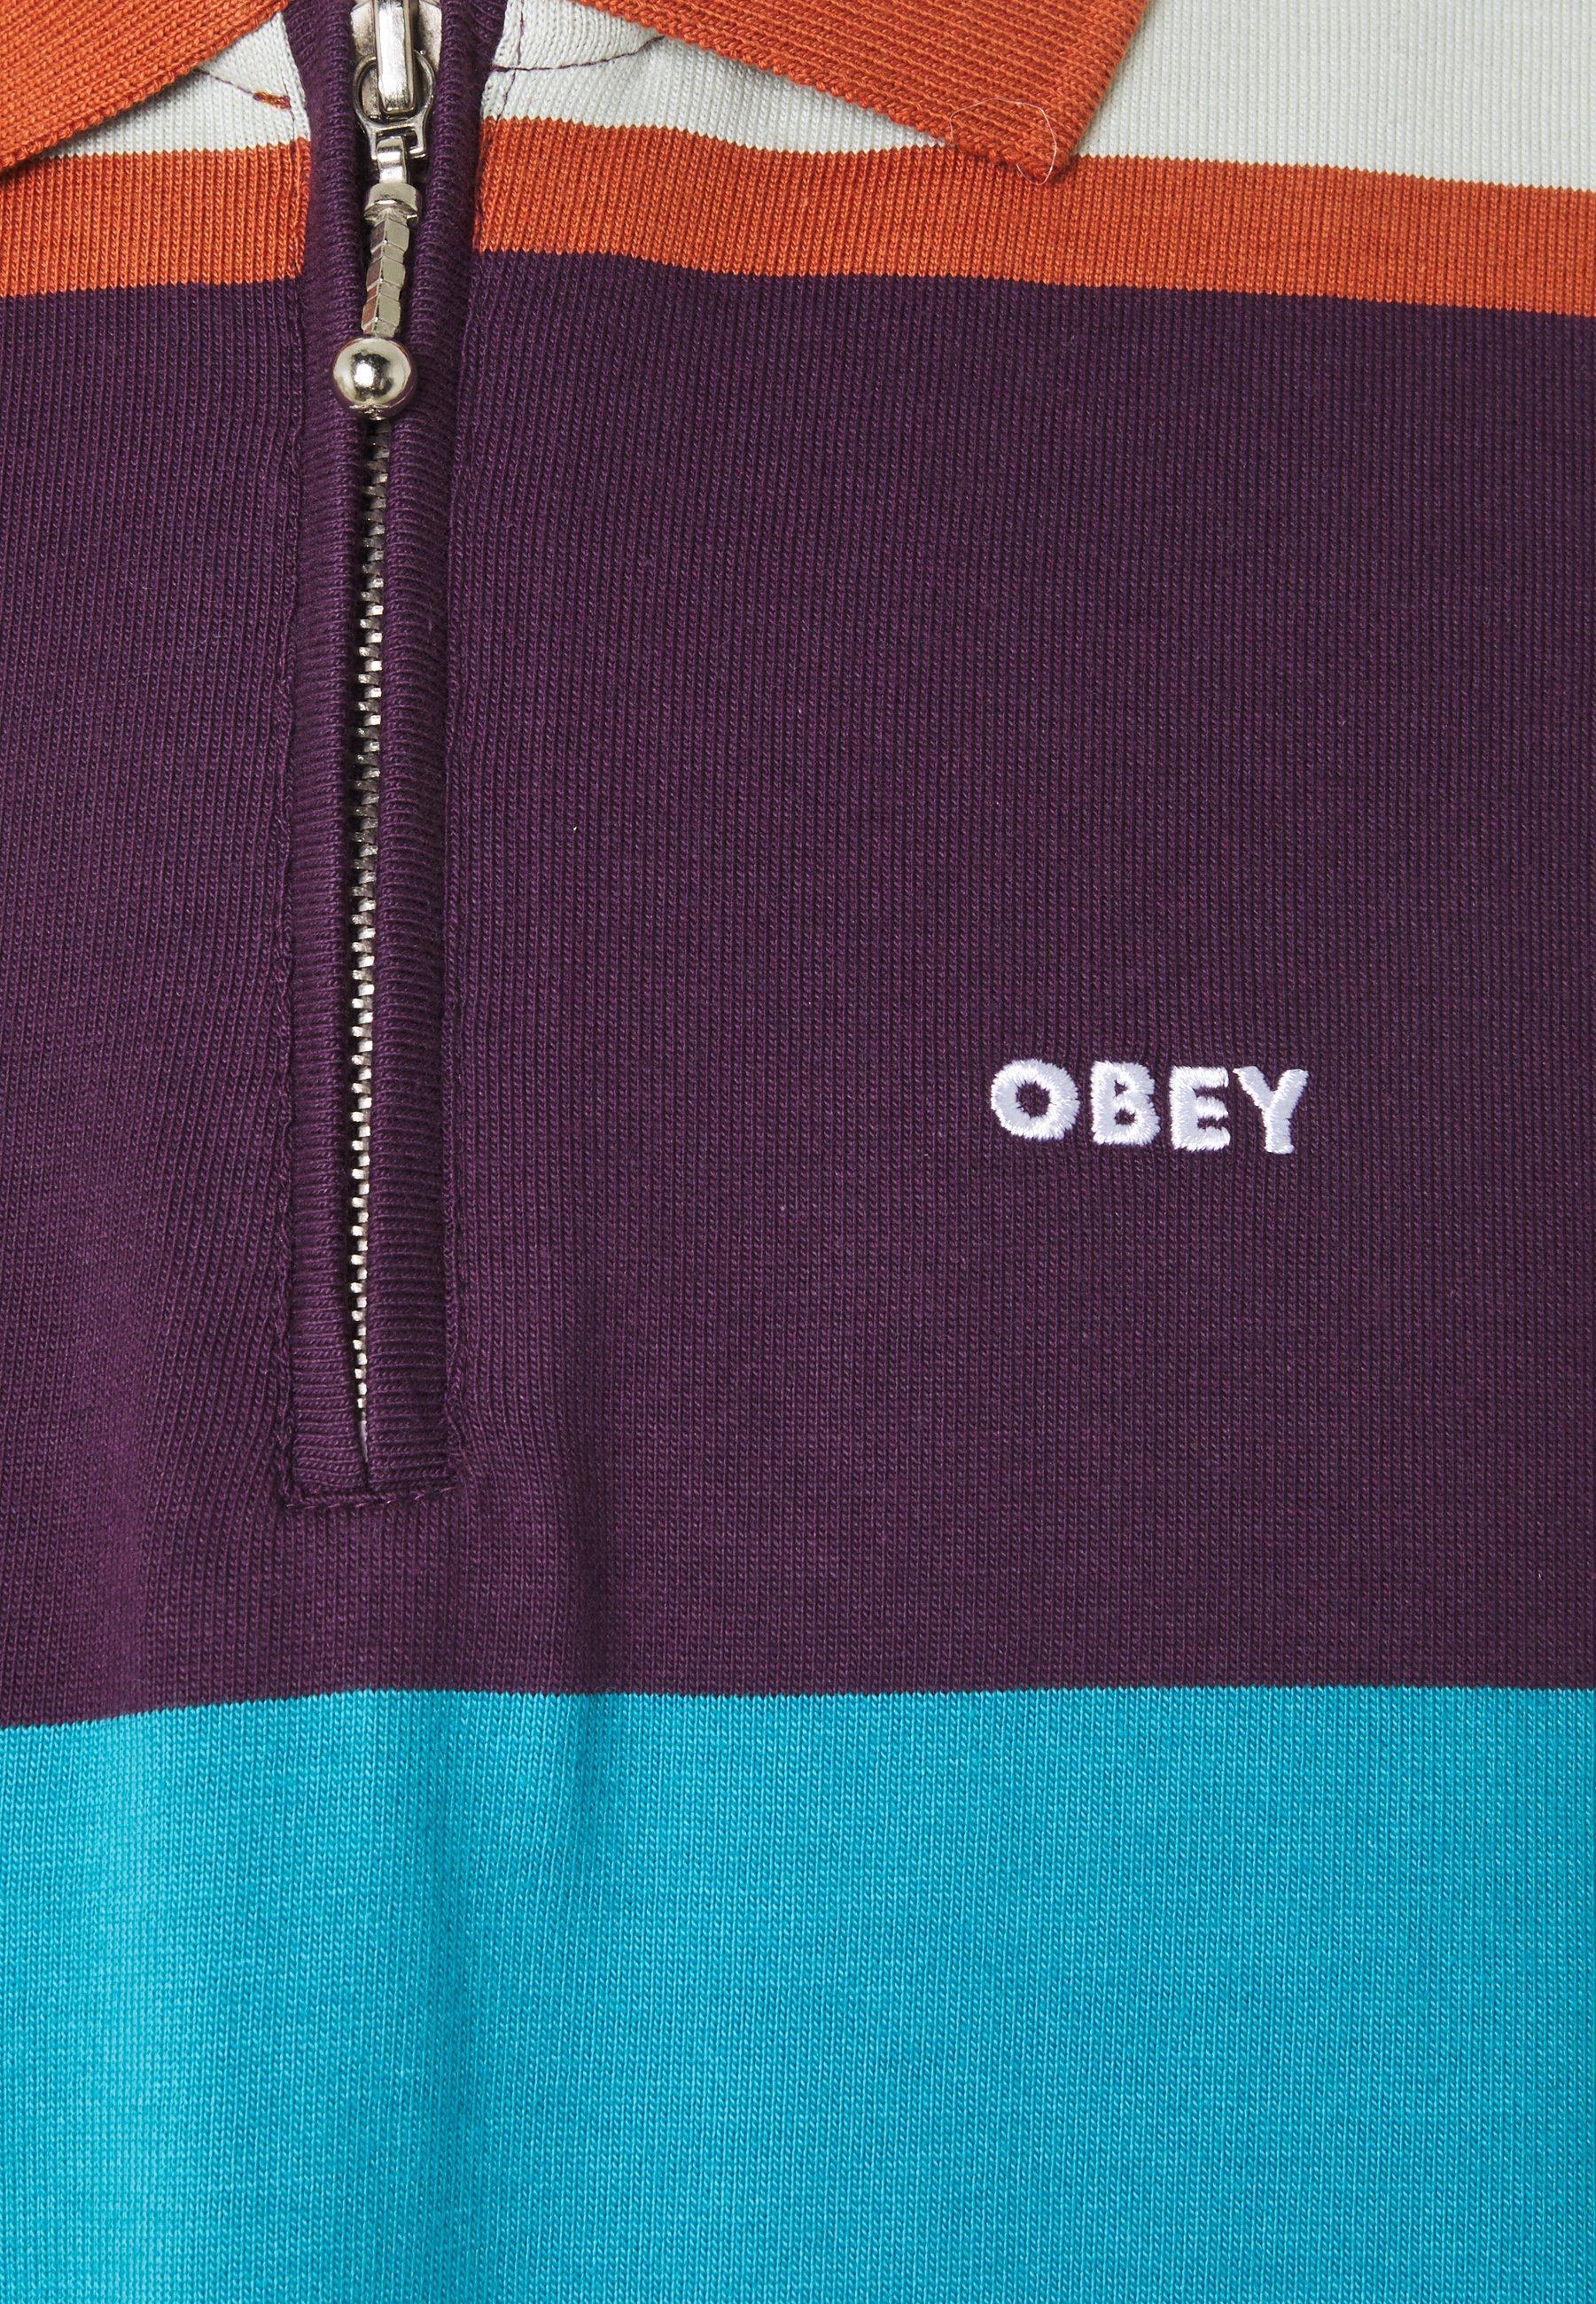 Obey Clothing STRUCTURE  - Poloshirt - purple multi/lila - Herrenbekleidung 9c4w4